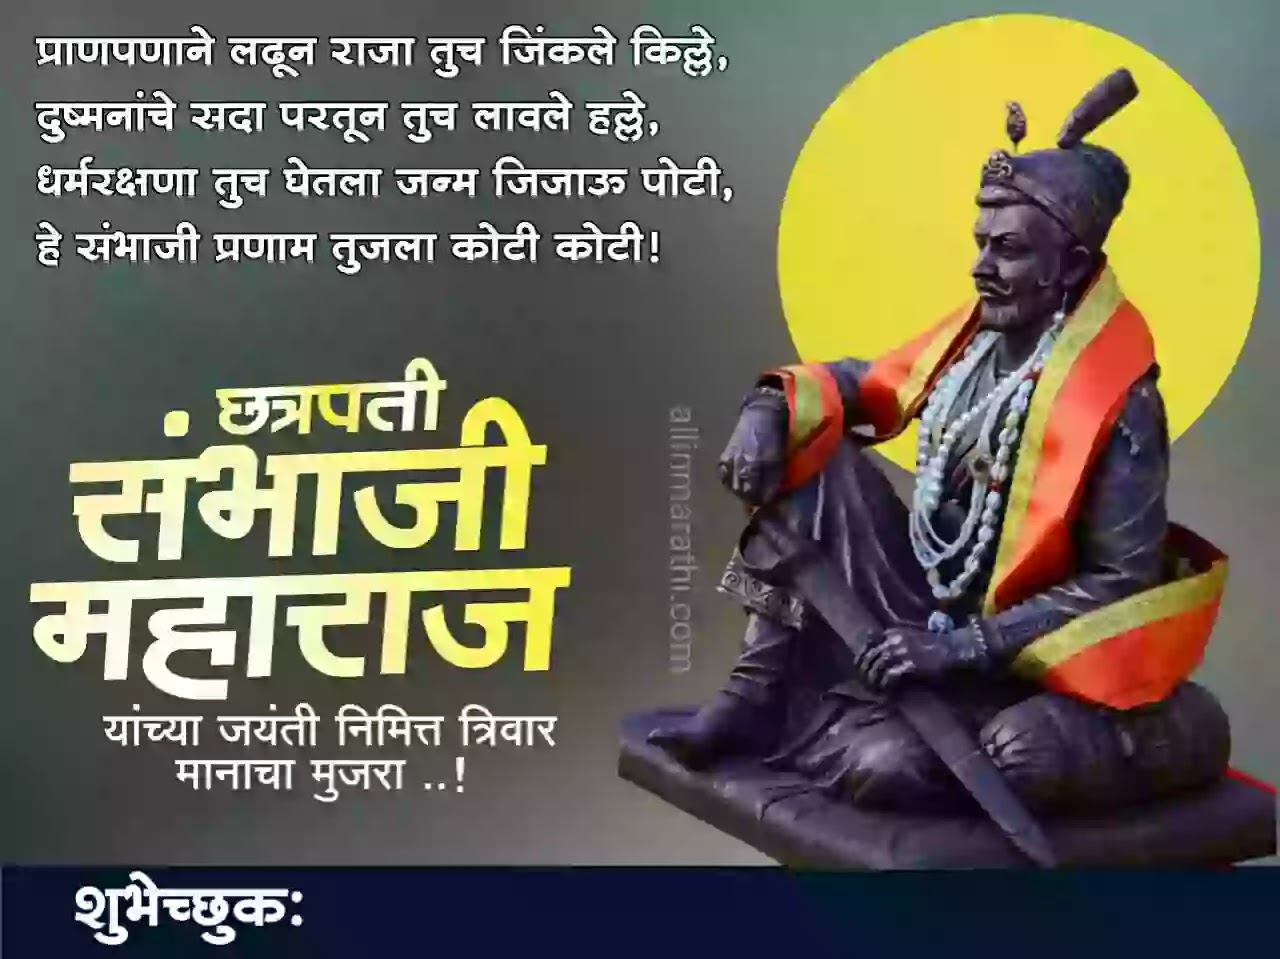 Sambhaji-maharaj-jayanti-banner-marathi